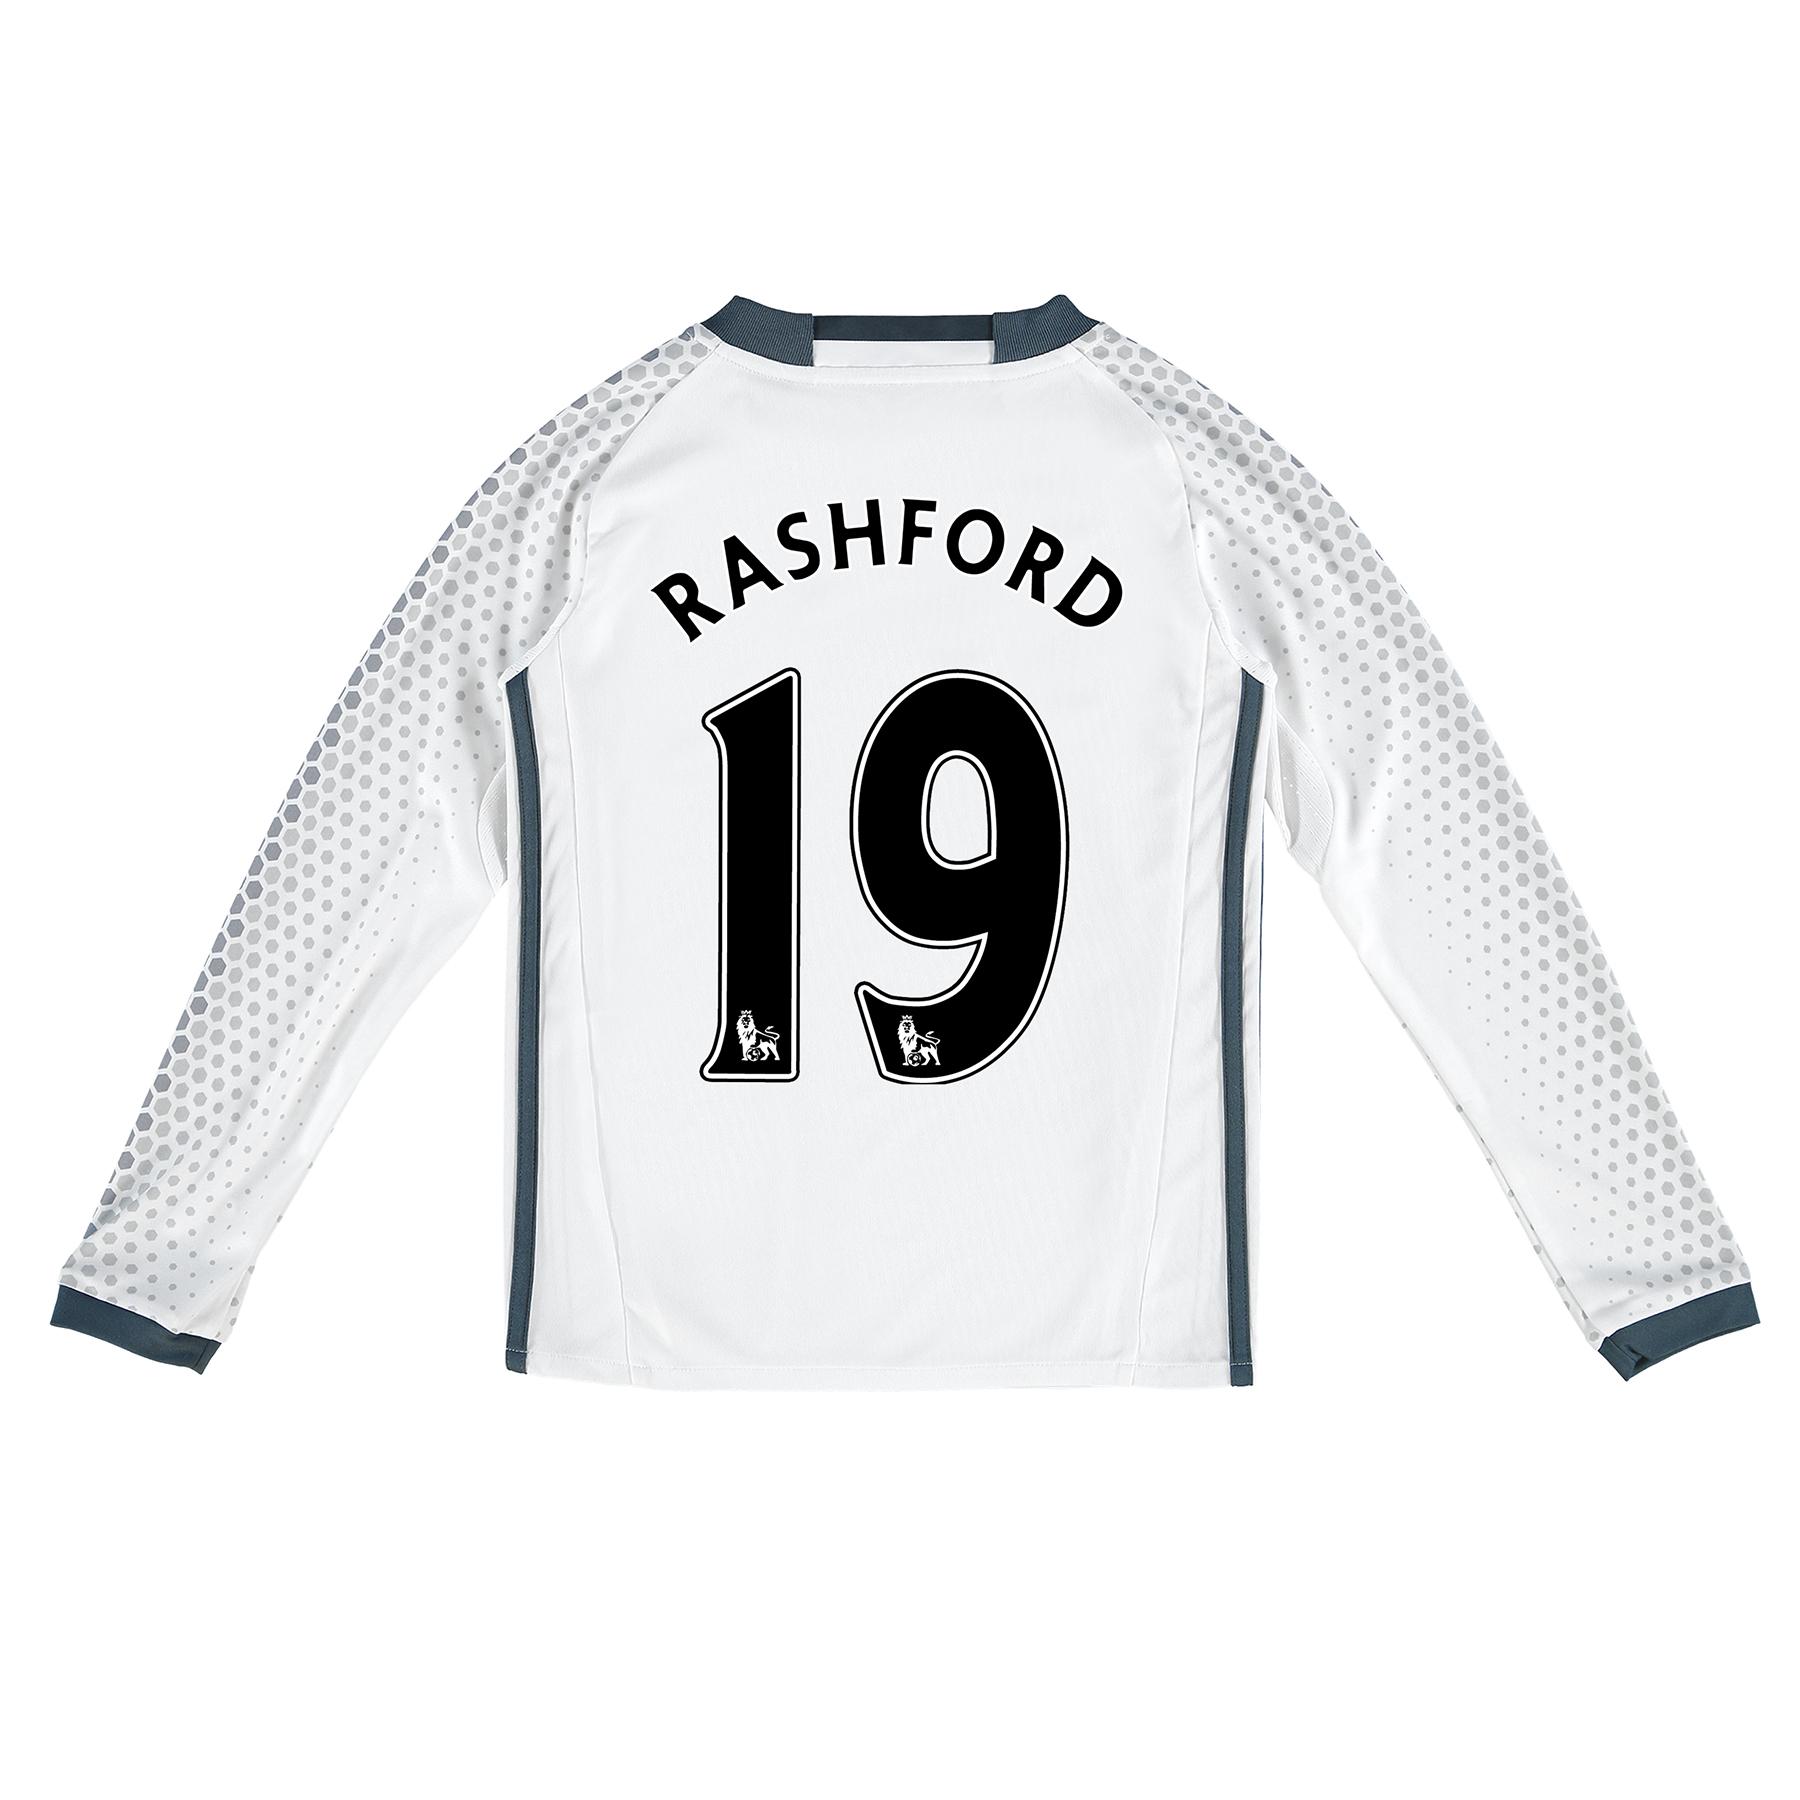 Manchester United Third Shirt 2016-17 - Kids - Long Sleeve with Rashfo